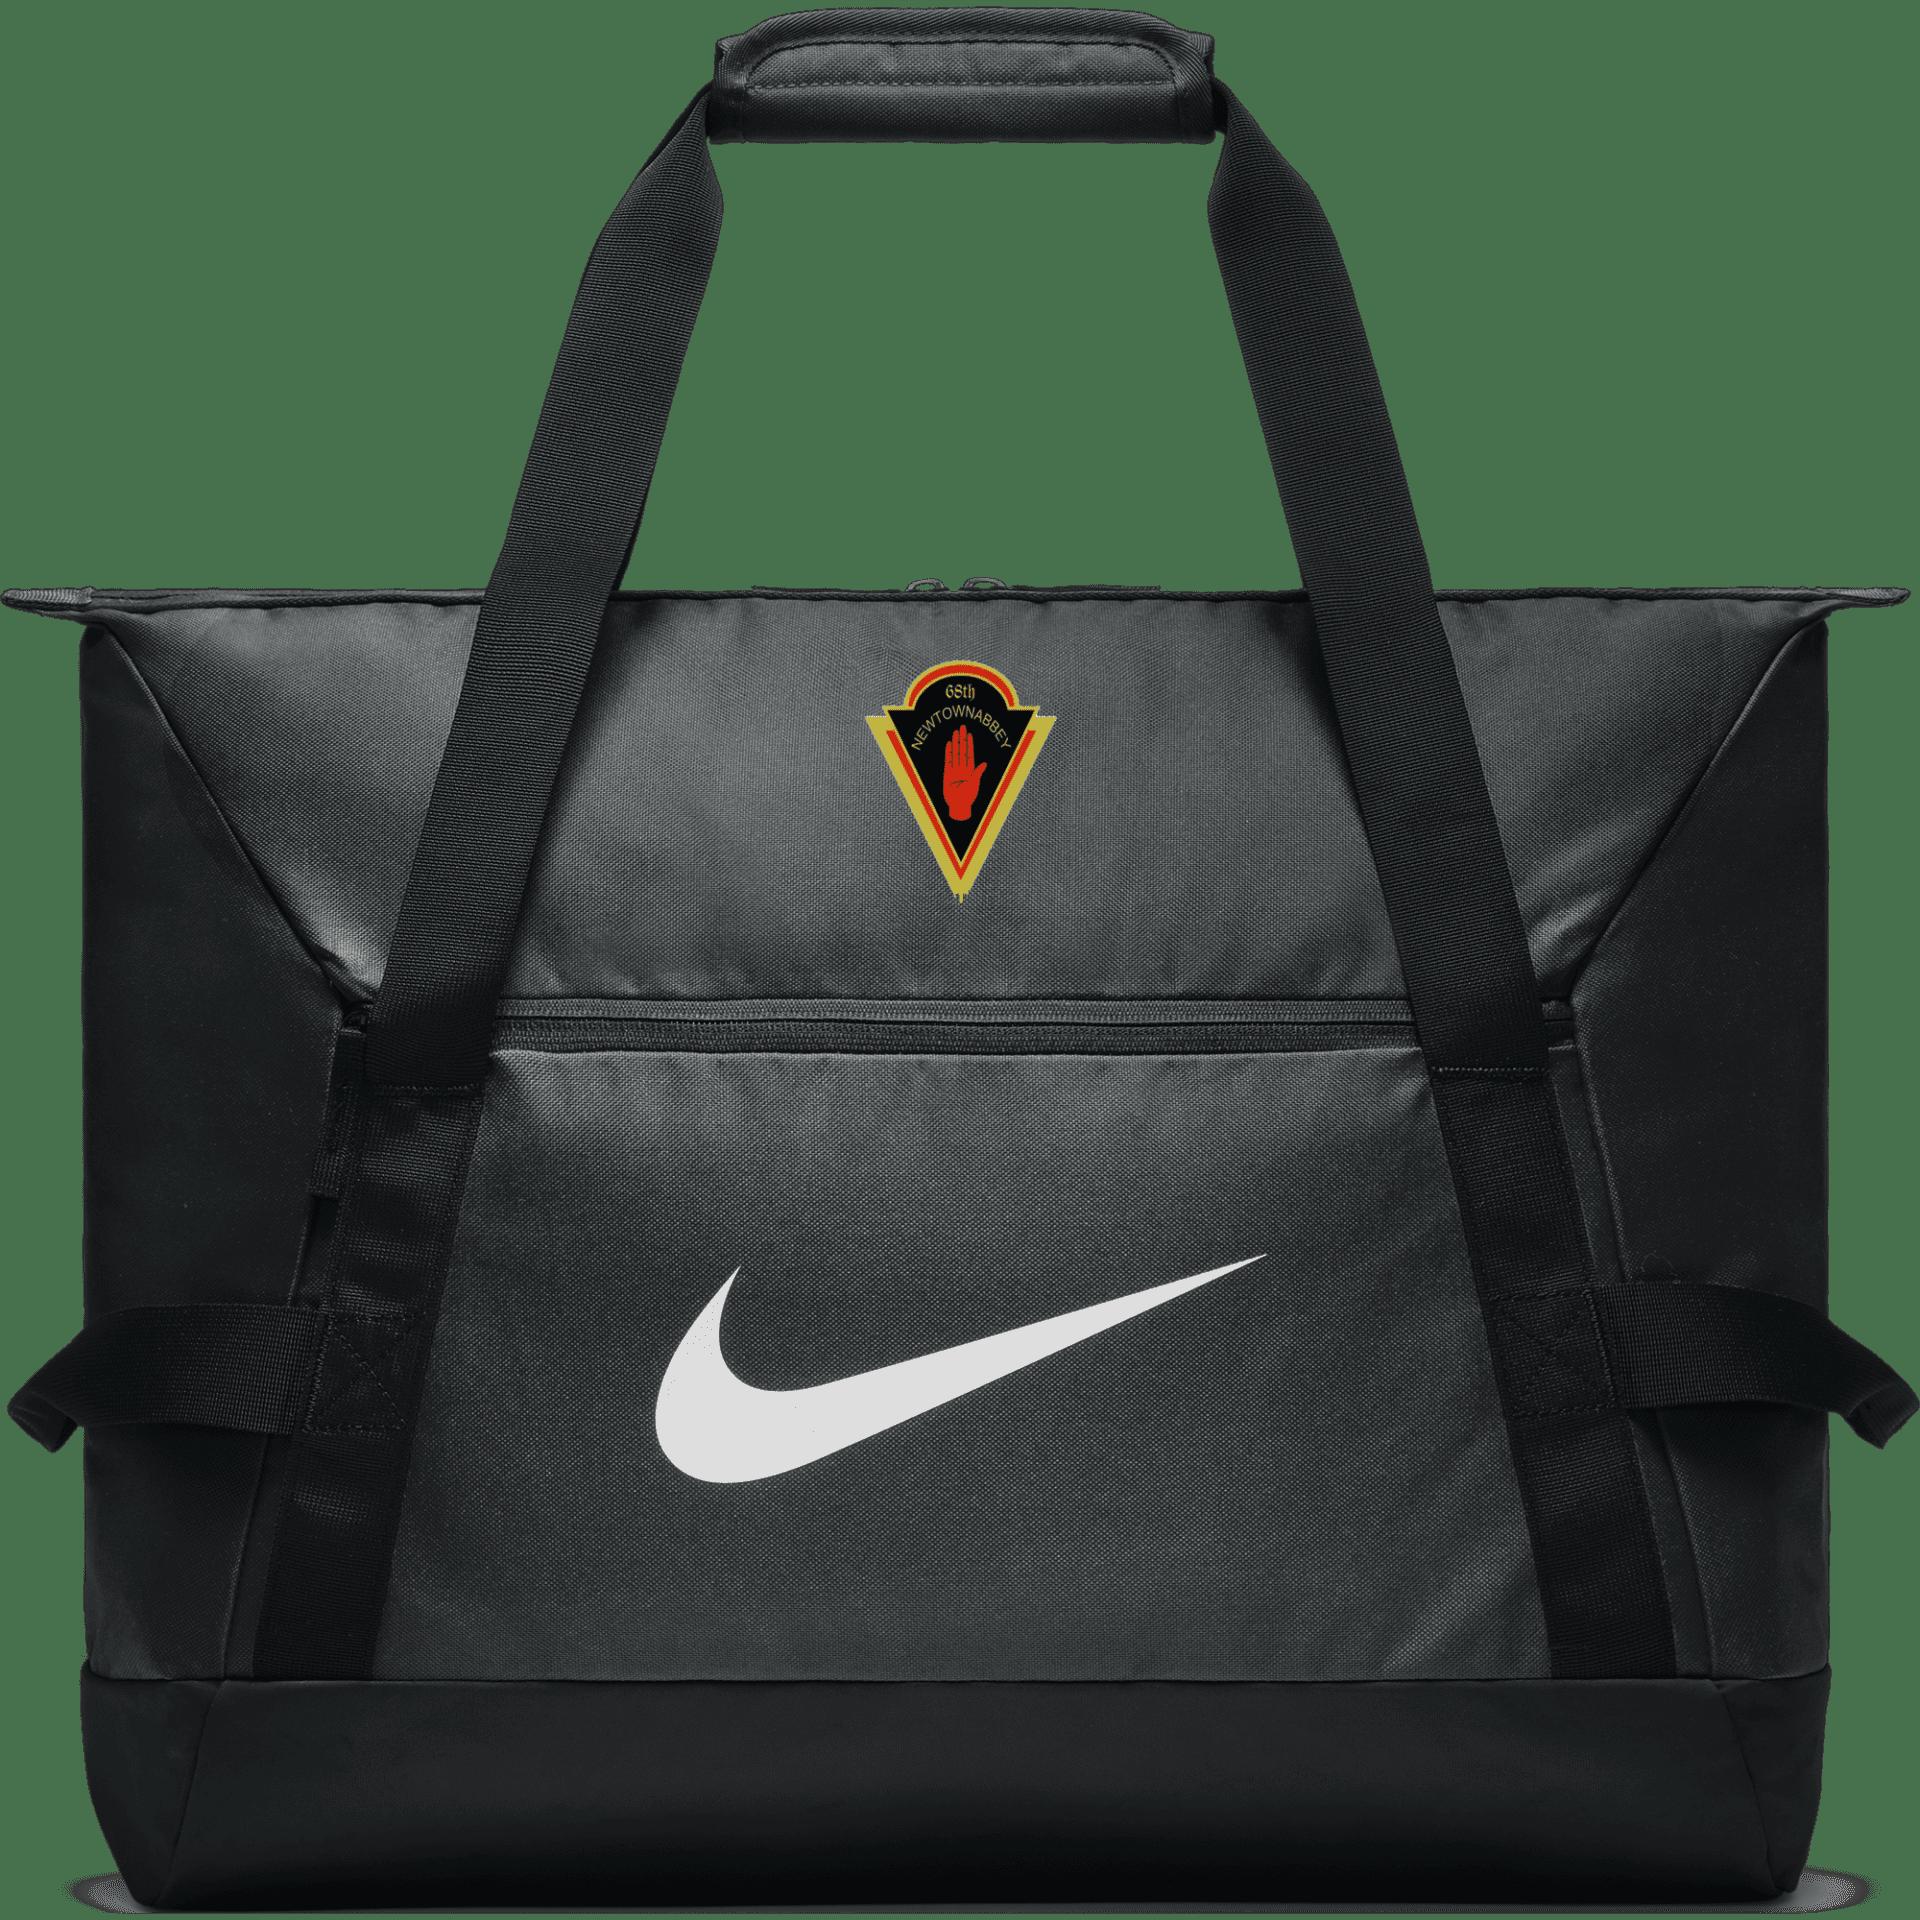 68th newtownabbey duffel bag 33974 p